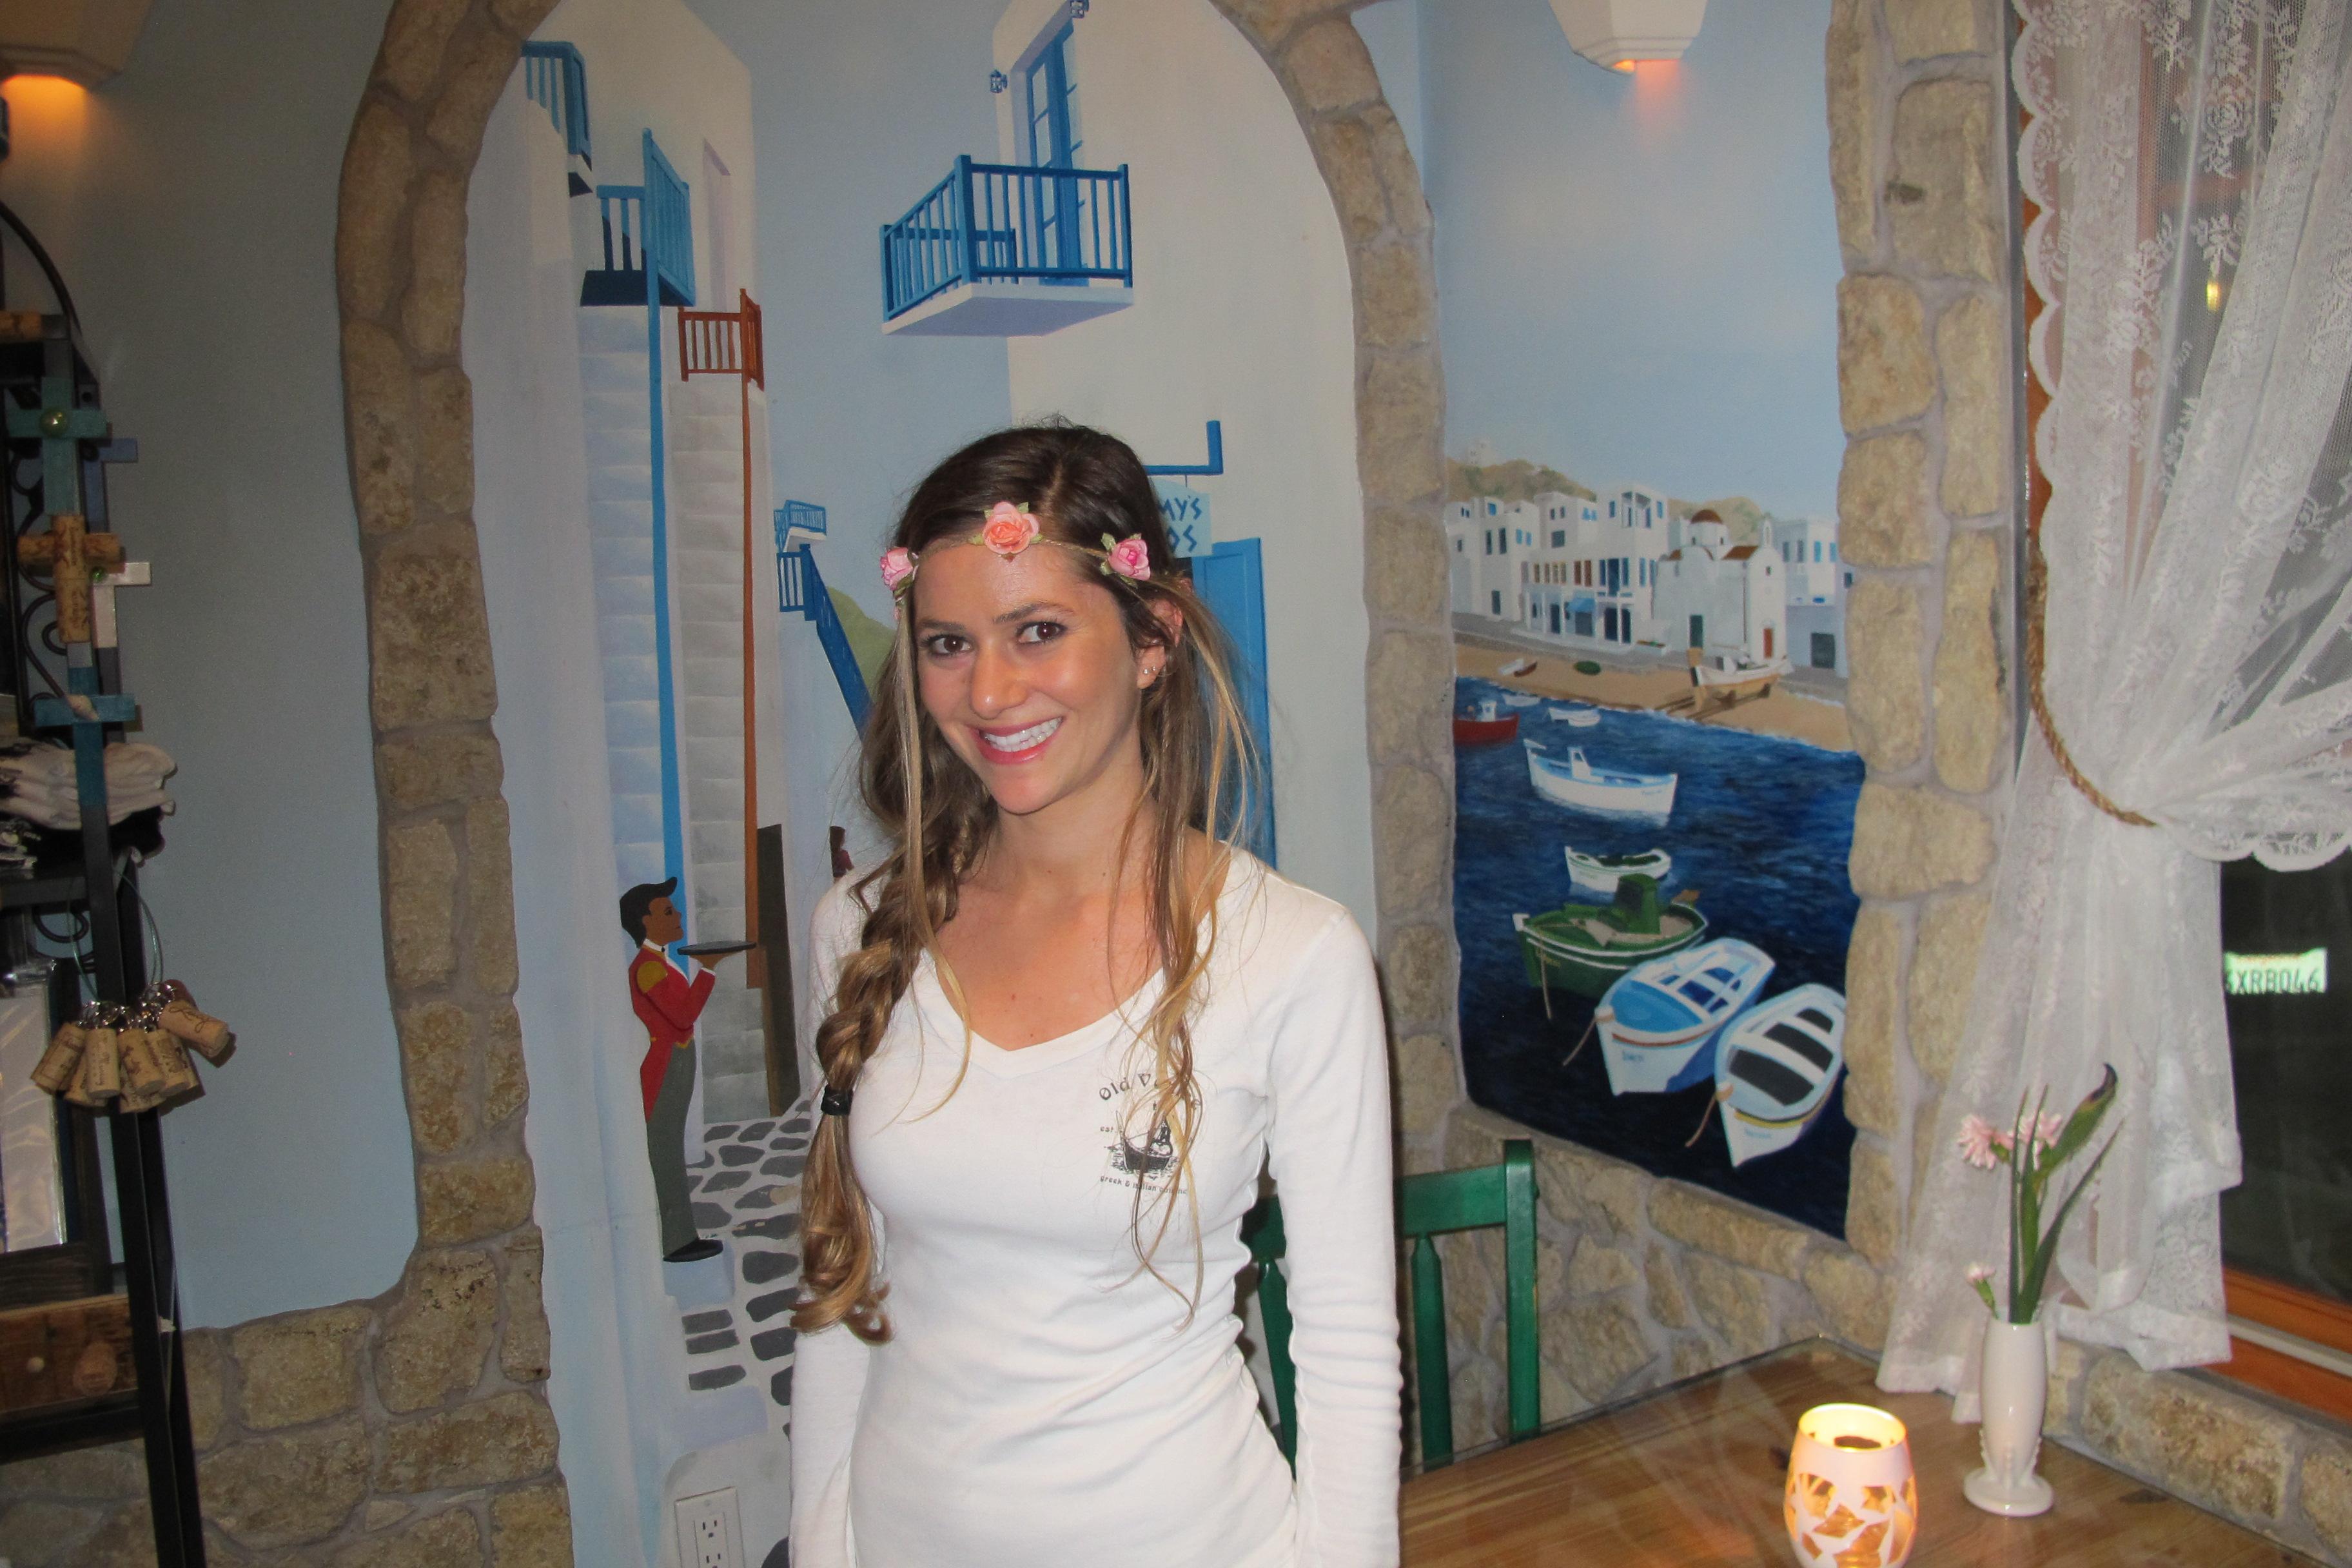 Natalie at Old Venice: Best Server (female)